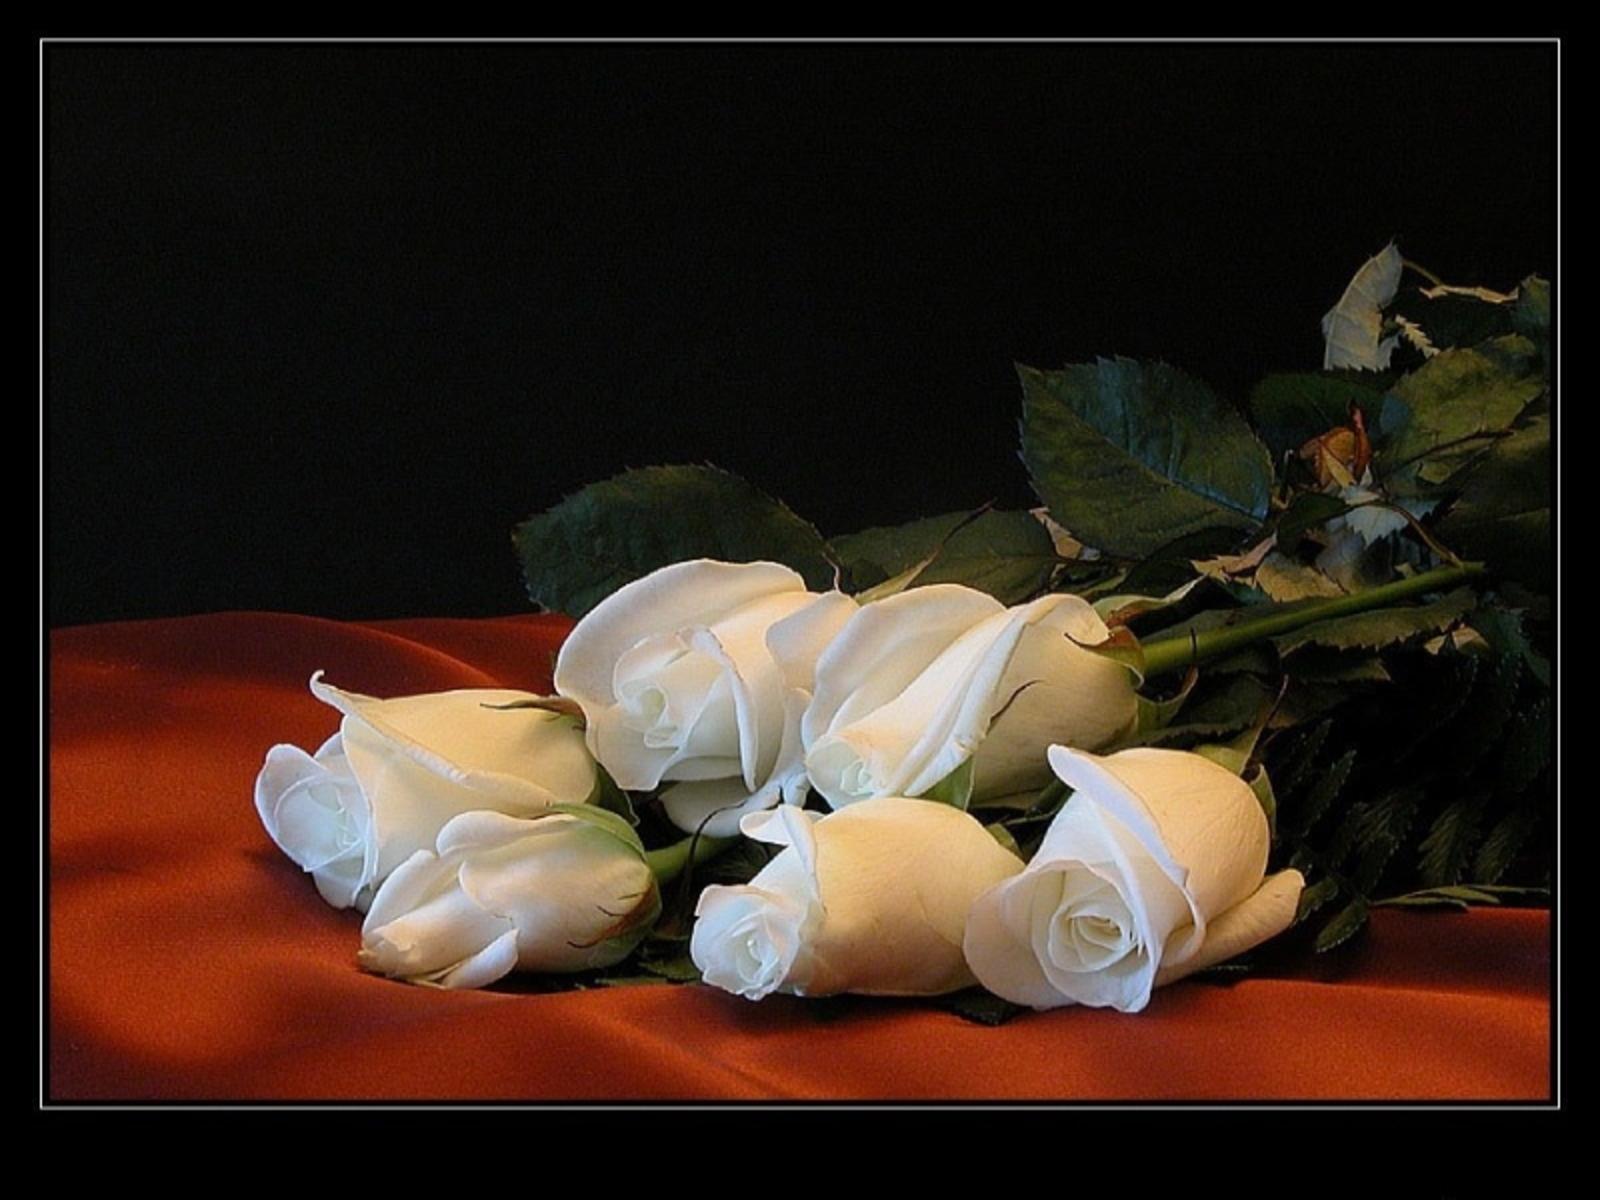 http://2.bp.blogspot.com/-F7o1jAIfN9A/Tj7pG2ISEgI/AAAAAAAAD54/PvvvHelcQRA/s1600/trandafiri_albi_frumosi.JPG